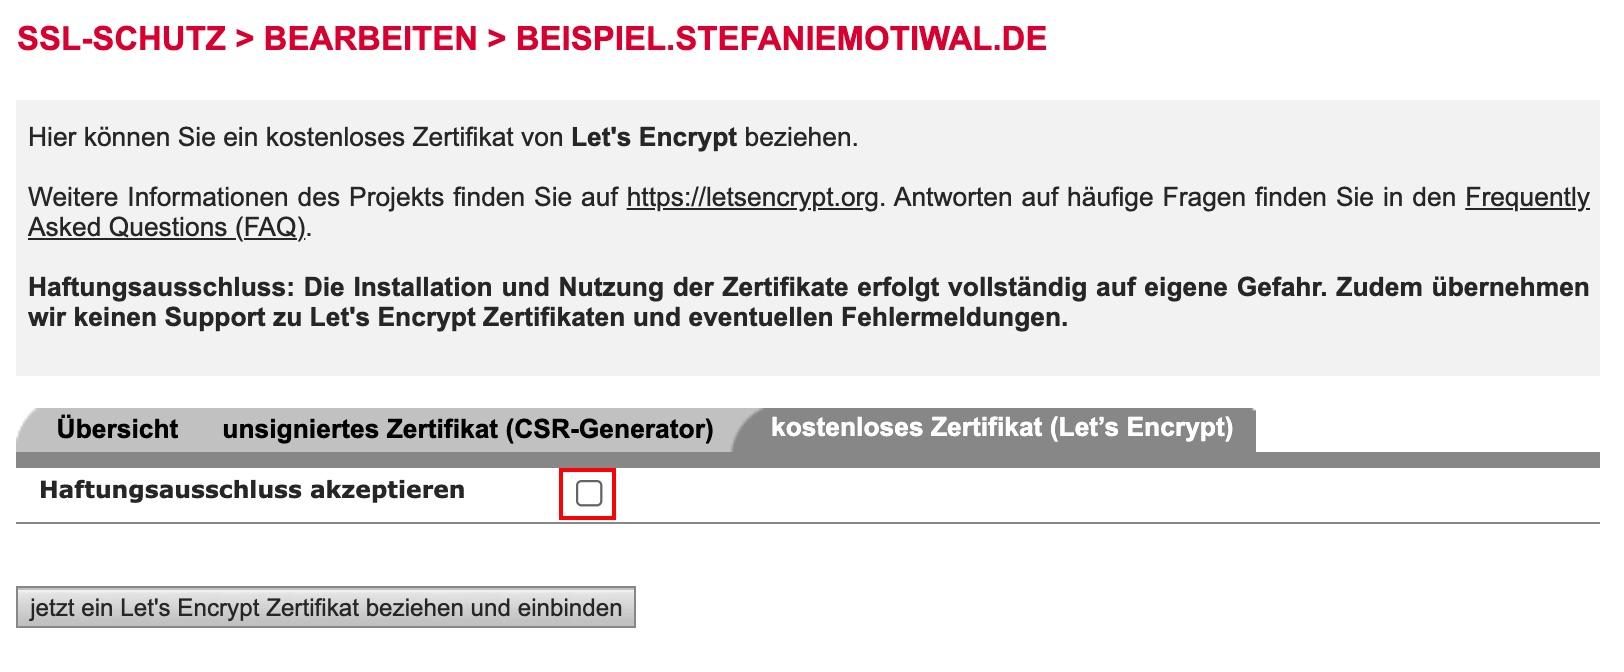 Lets Encrypt Zertifikat beziehen